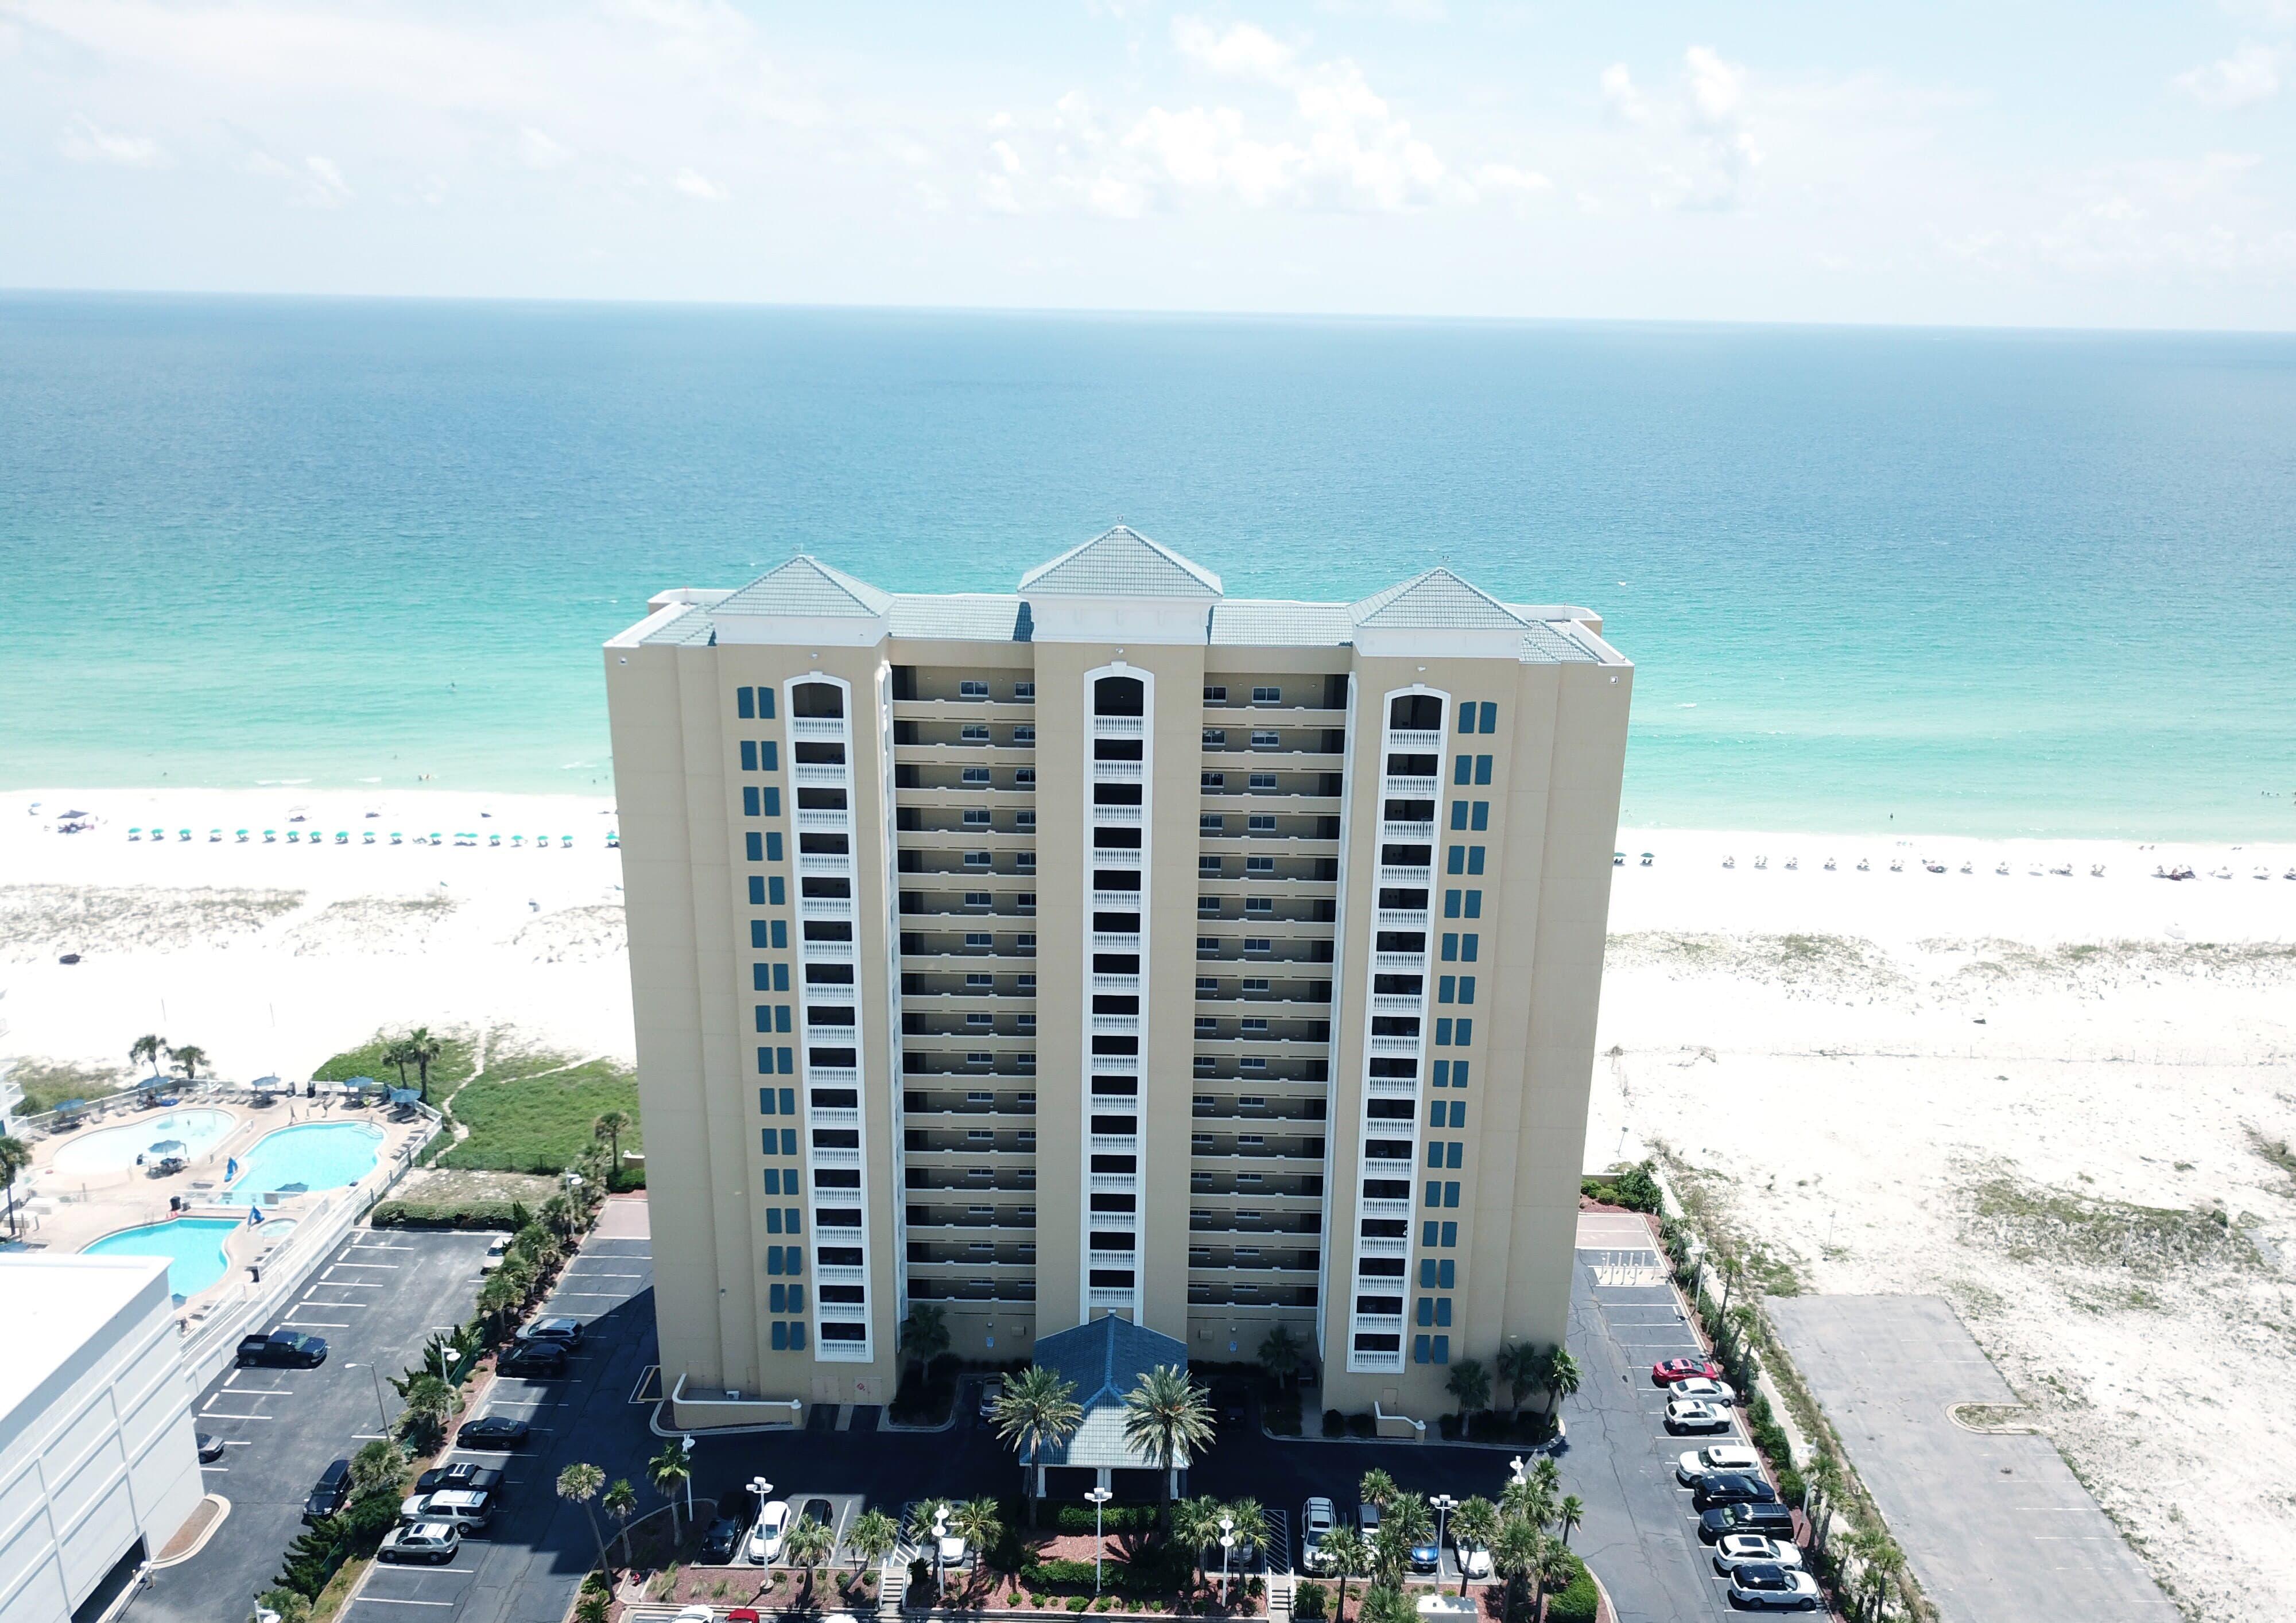 Emerald Isle #101 Condo rental in Emerald Isle Pensacola Beach in Pensacola Beach Florida - #39